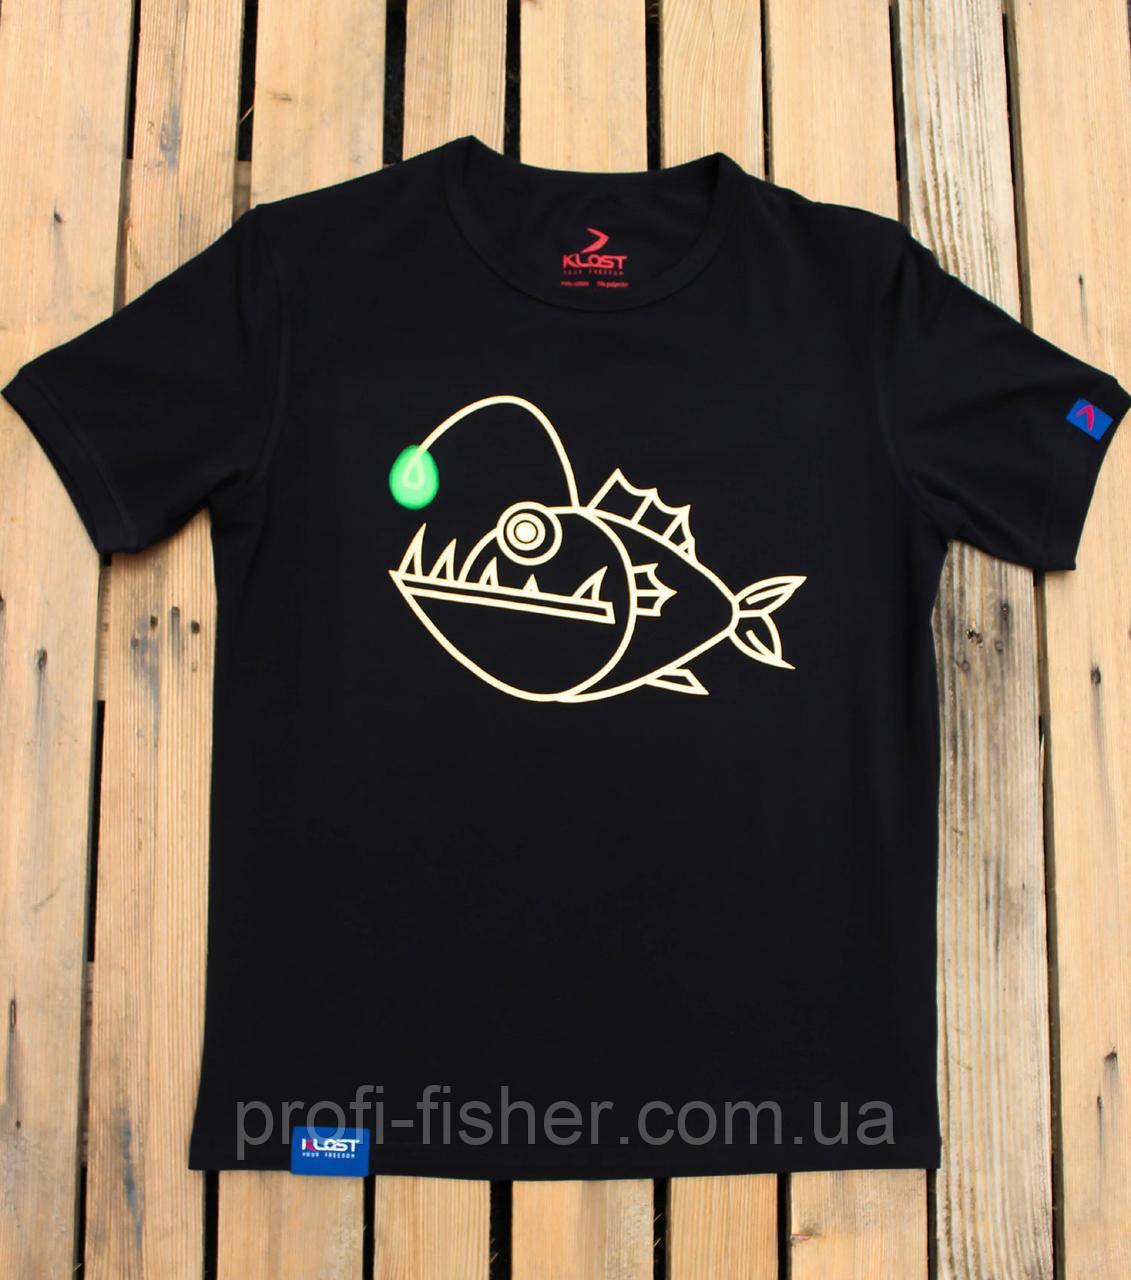 Футболка KLOST Angler Fish 70.01 3XL Black